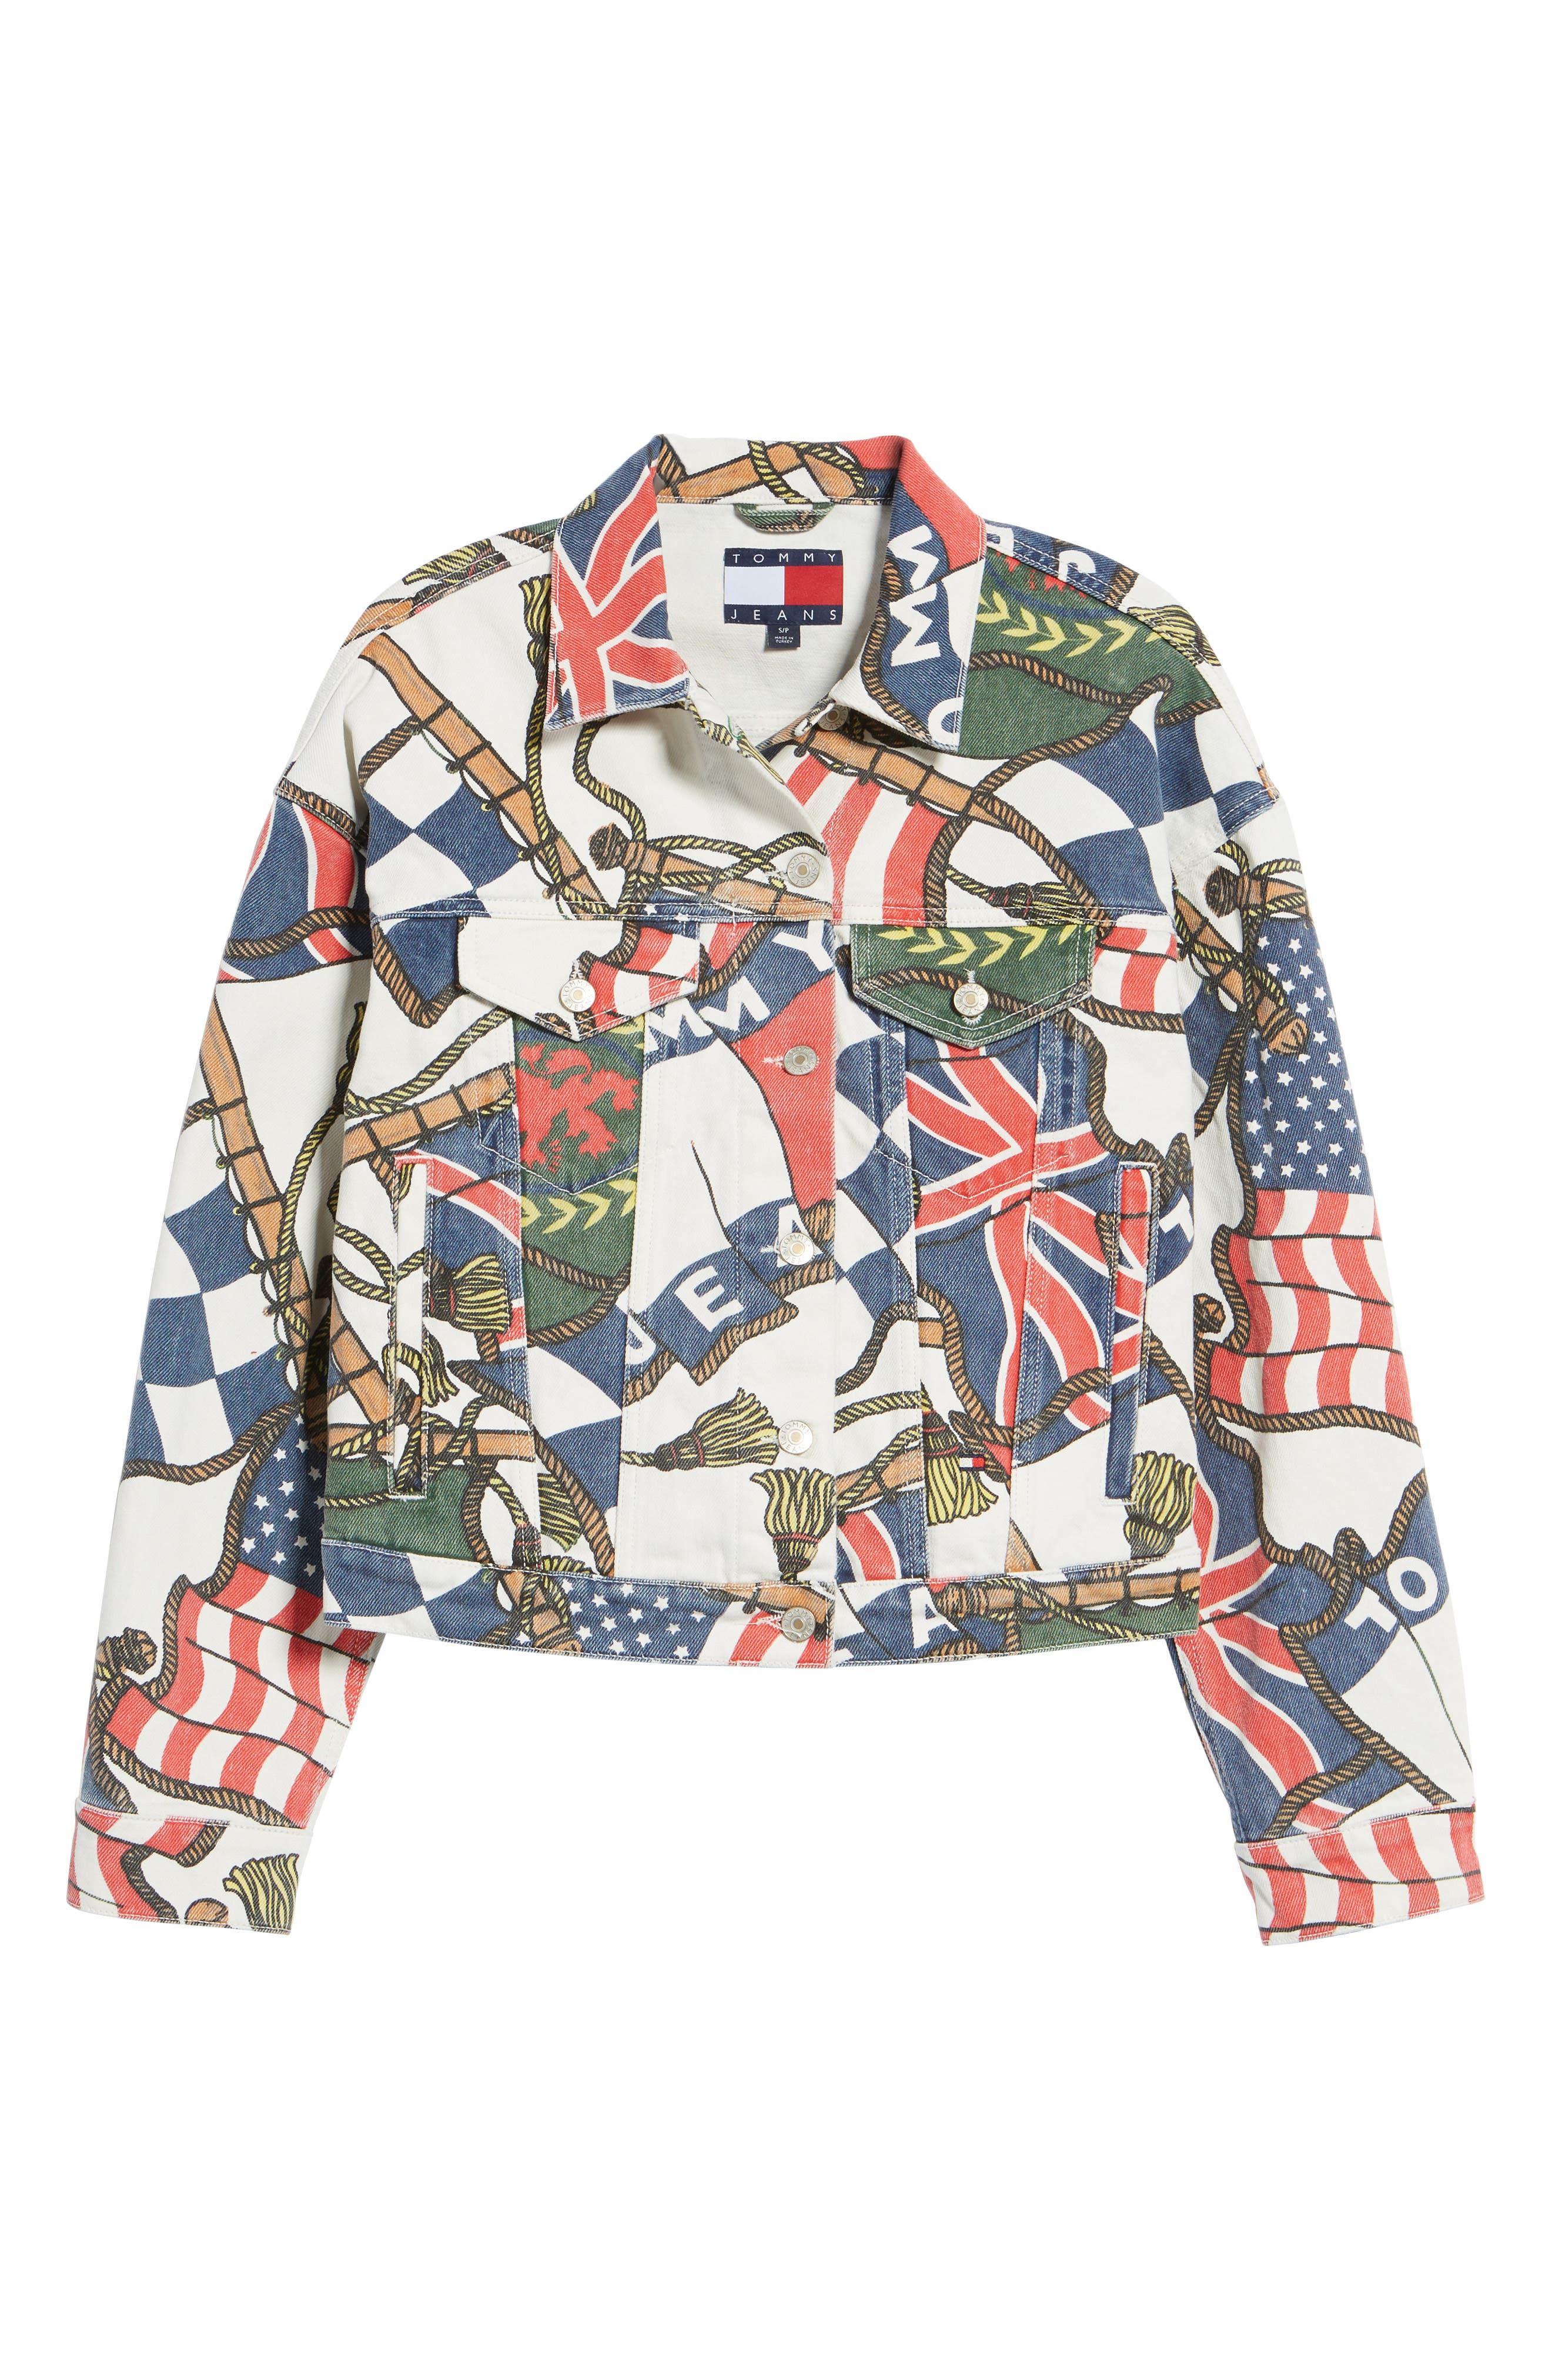 '90s Flag Print Denim Jacket,                             Alternate thumbnail 7, color,                             Bright White / Multi